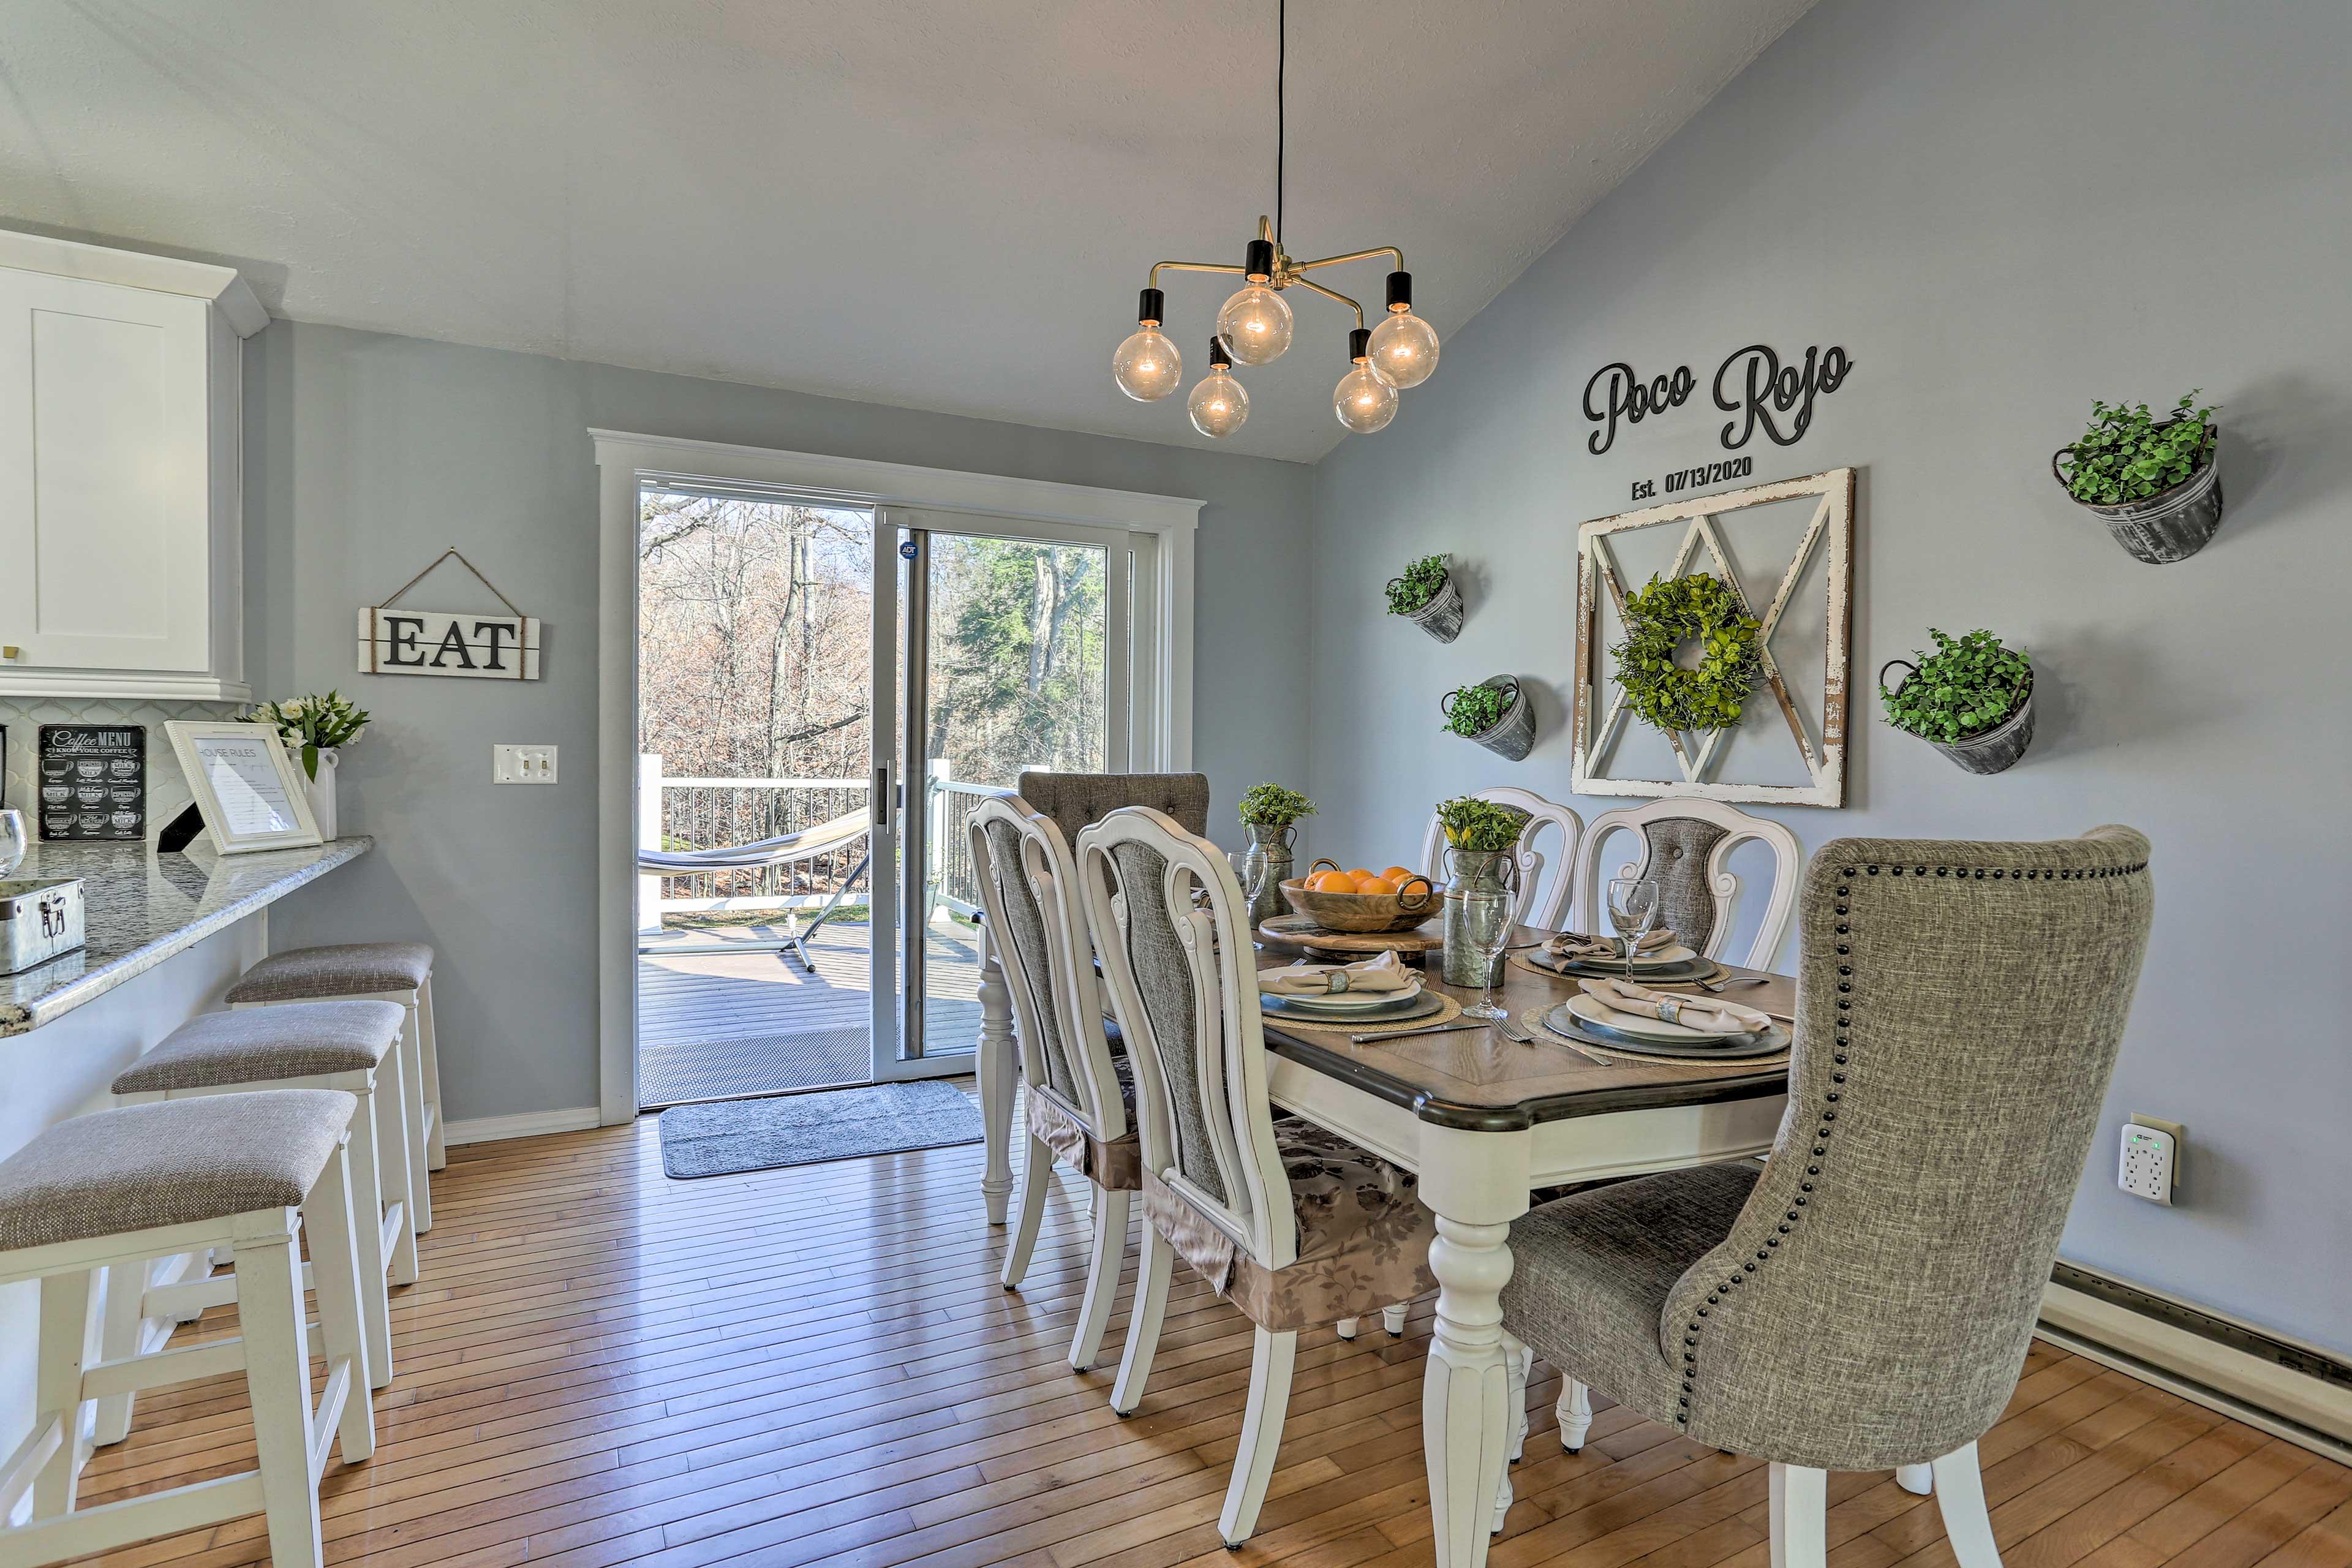 Dining Room | 2nd Floor | Dishware/Flatware Provided